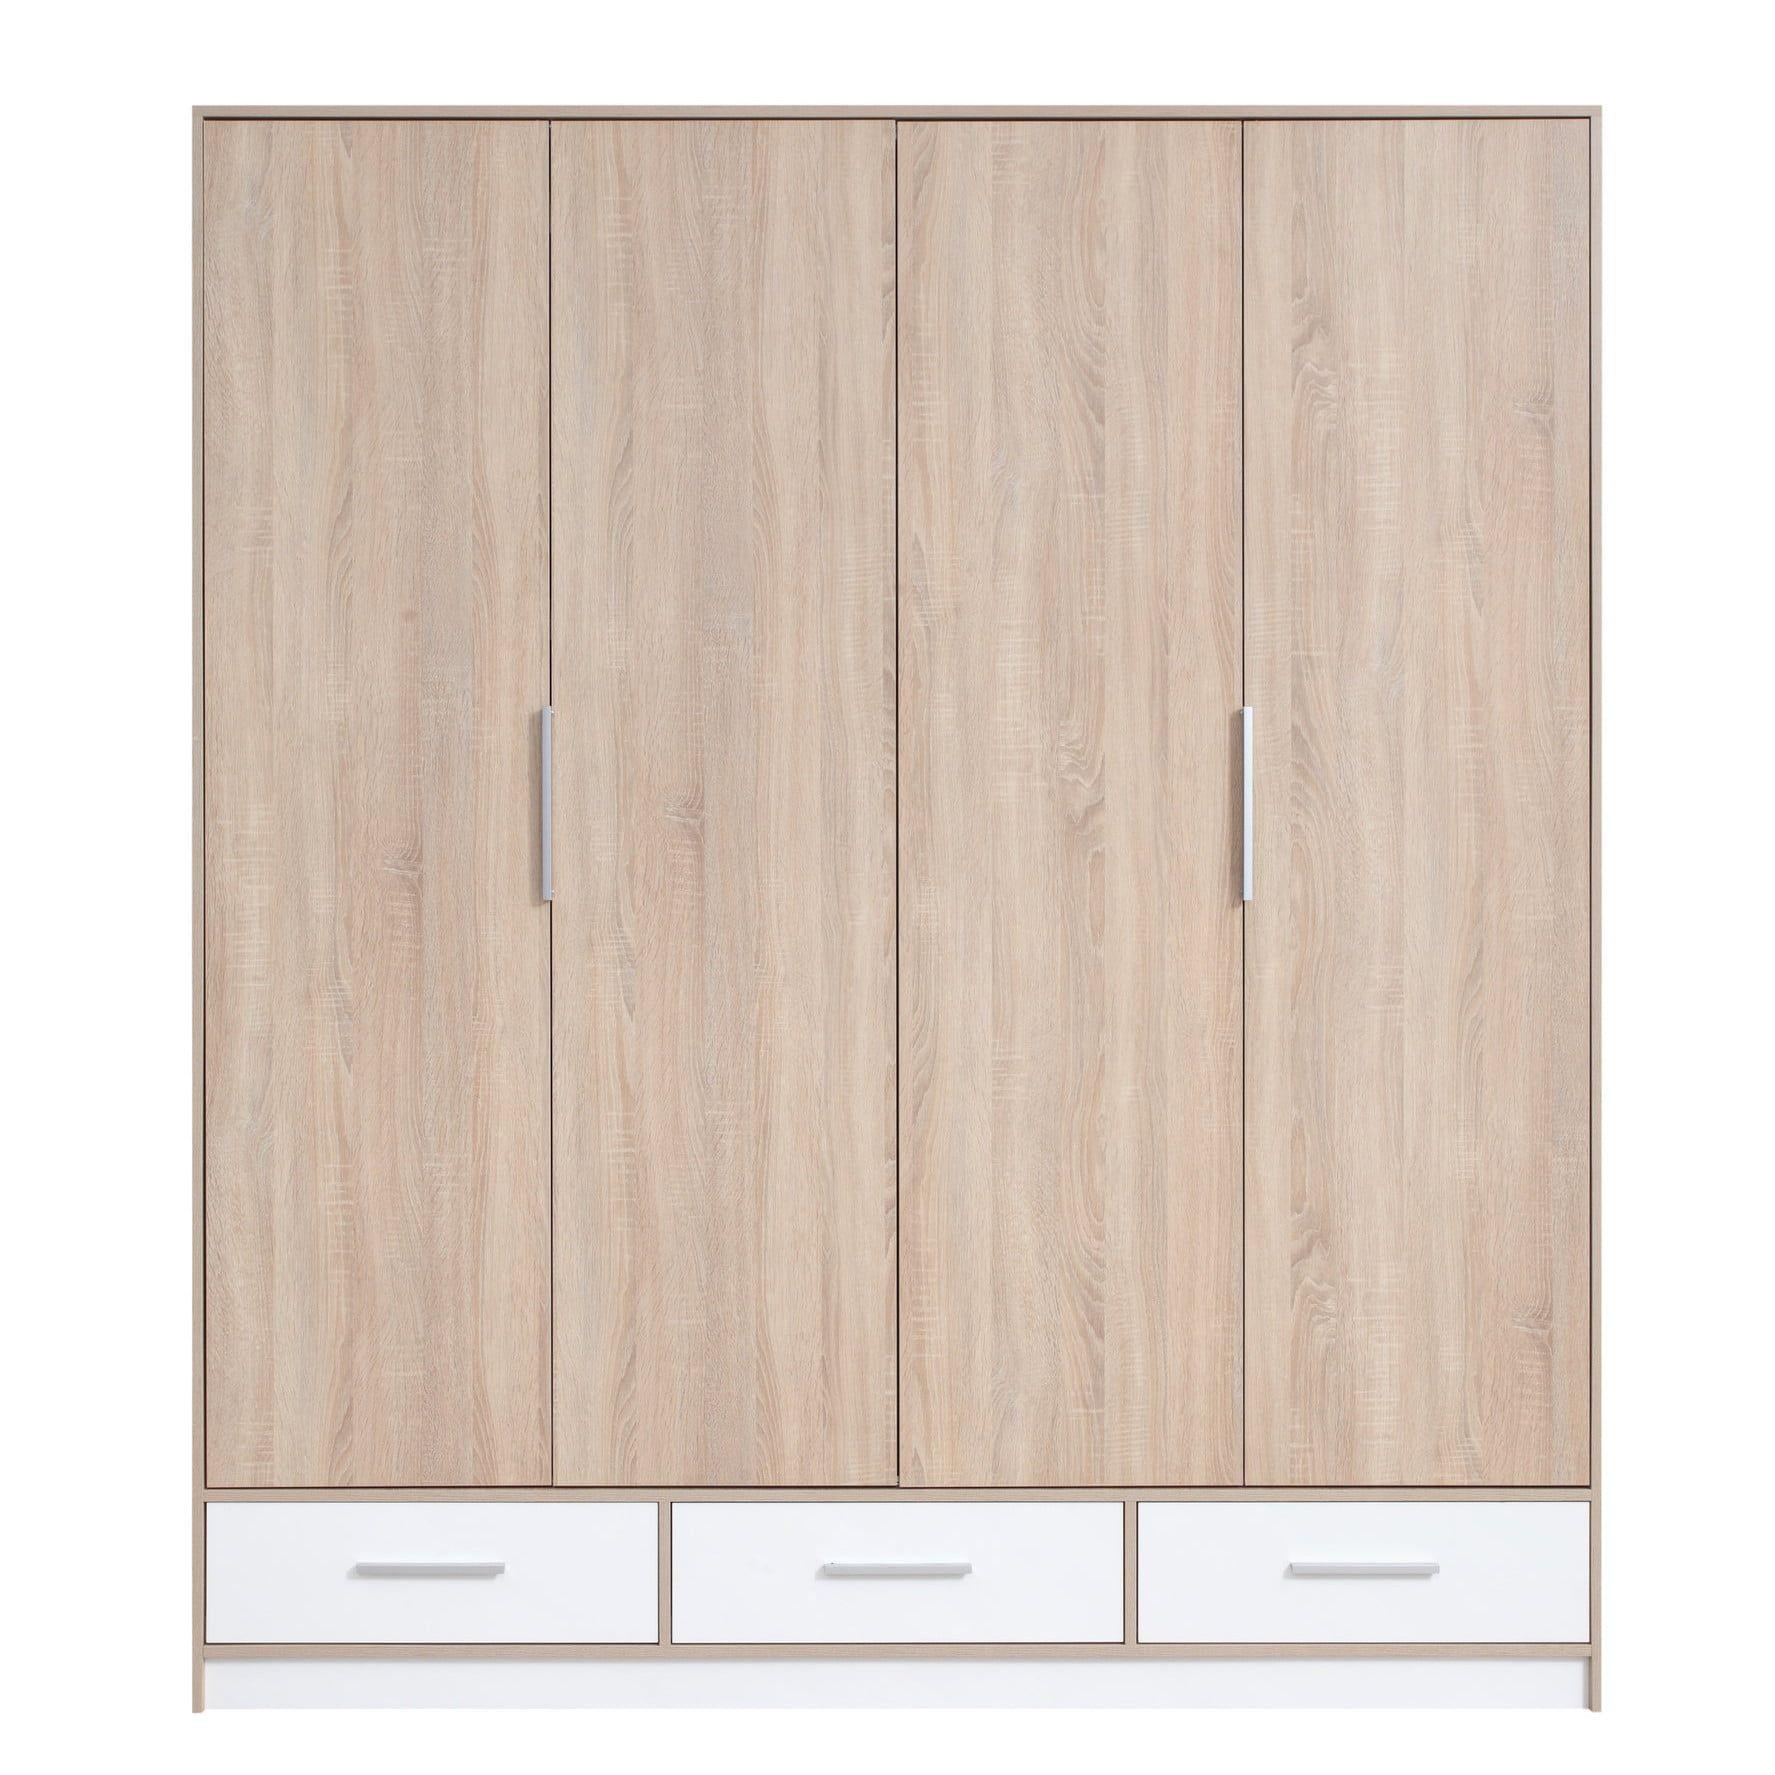 Isko wardrobe – Color: Sonoma Oak / White – Furniture